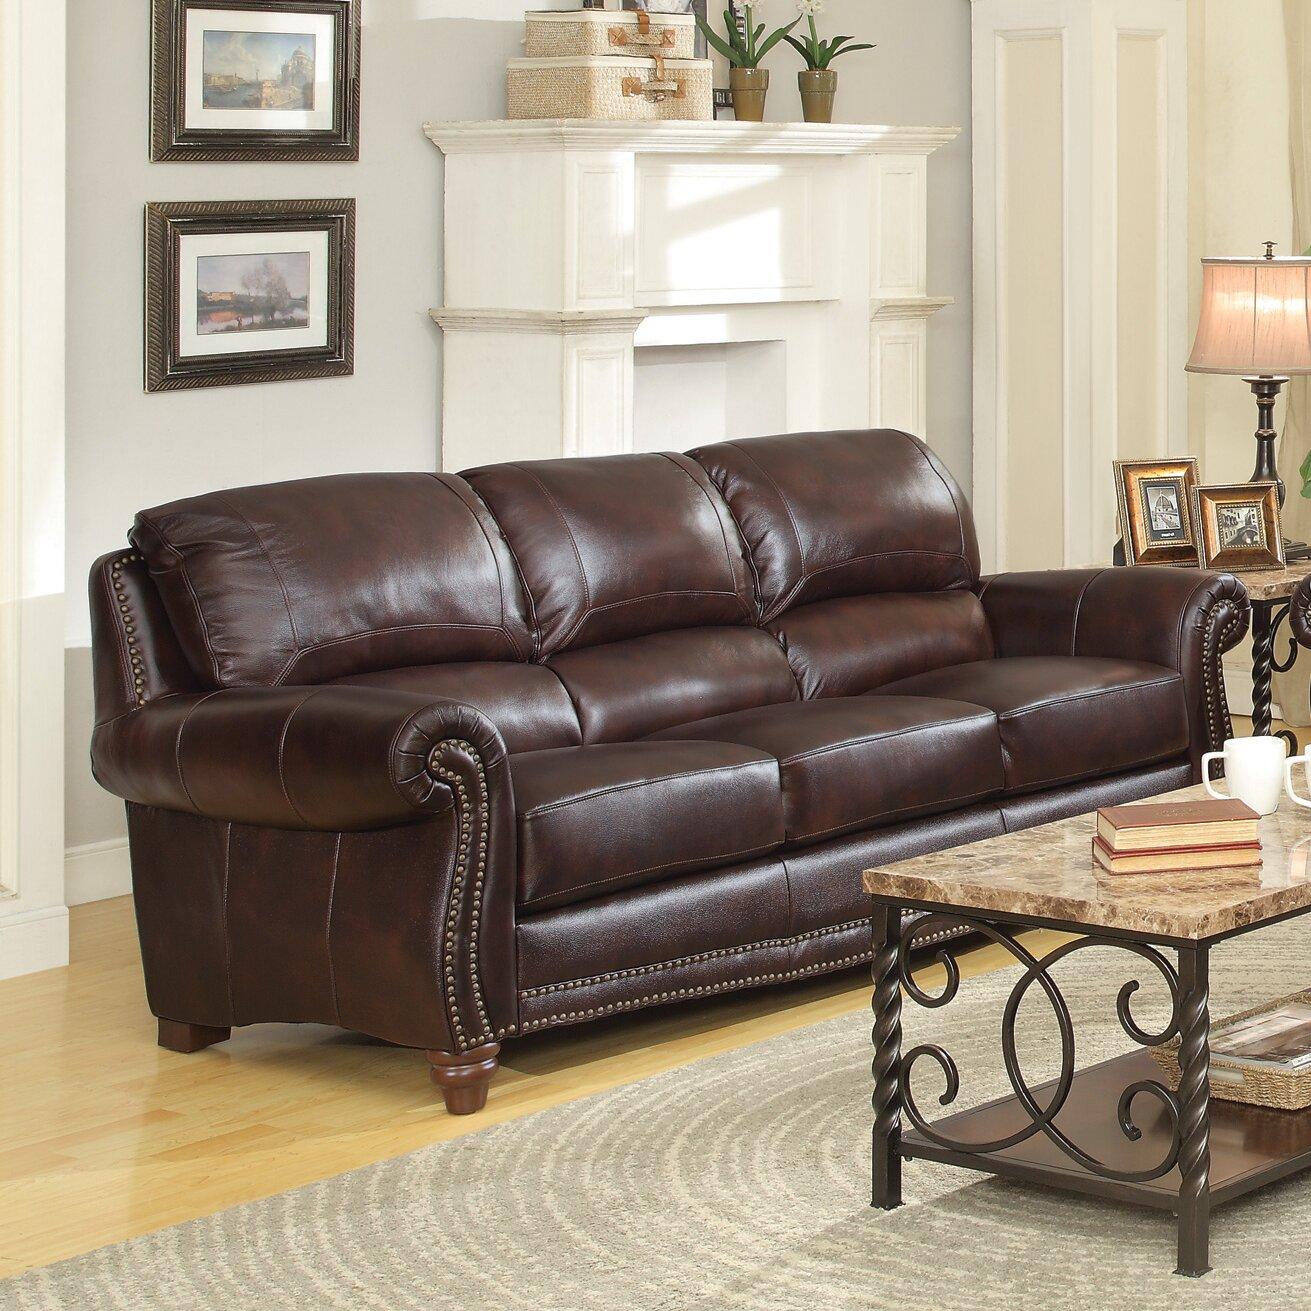 Wildon home leather sofa reviews wayfair for Leather sofa reviews